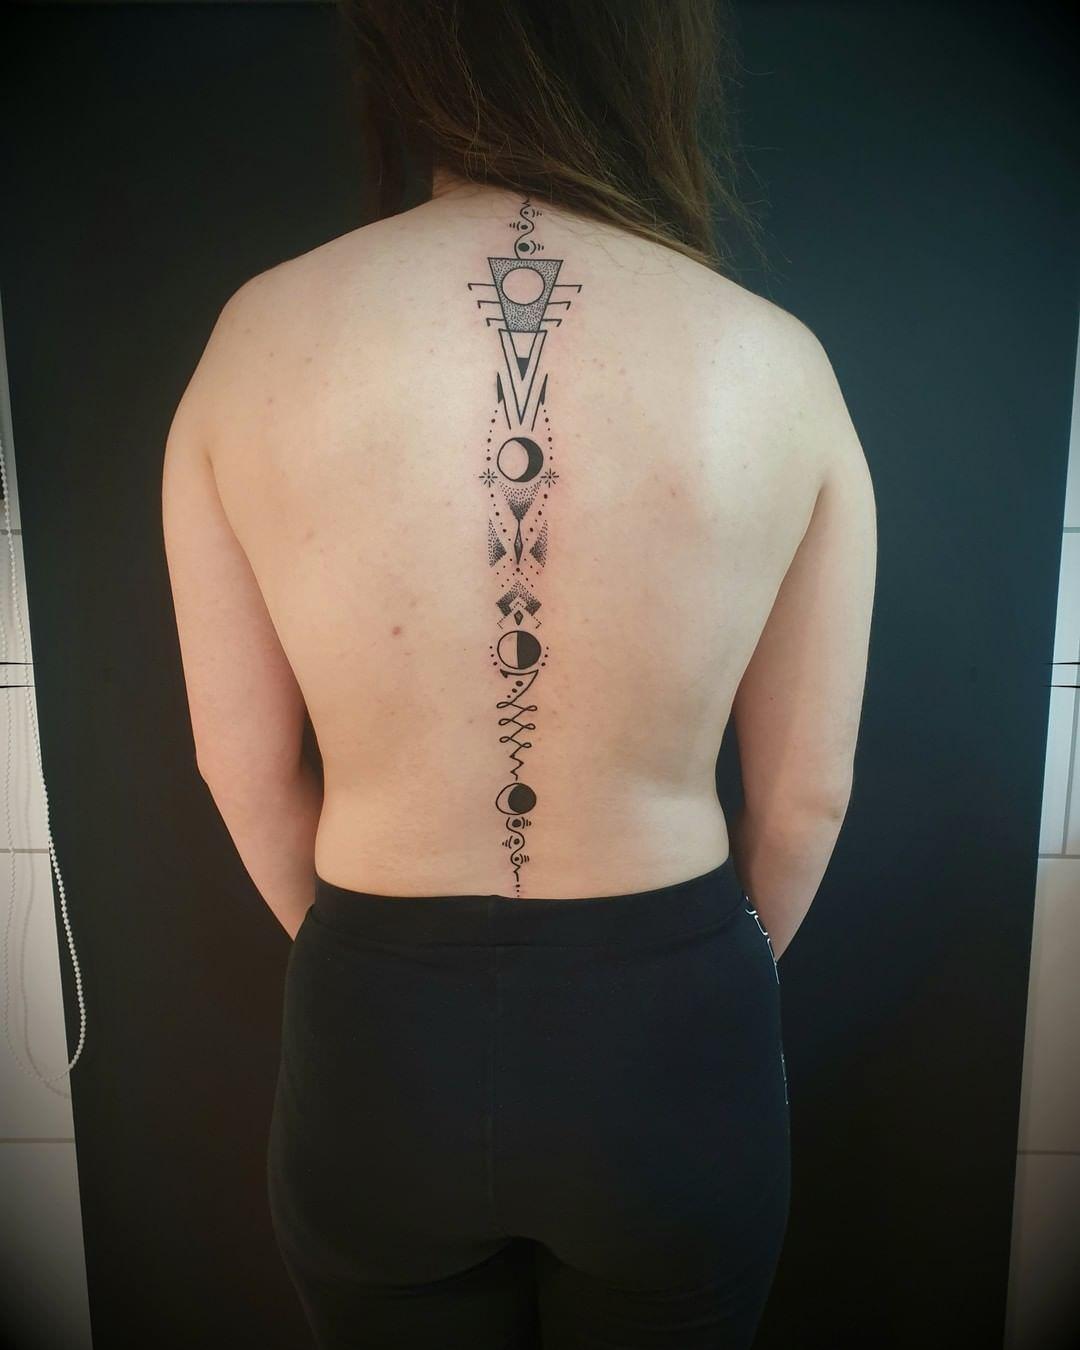 tattoogima_229847310_878623022742279_7203323586509289299_n